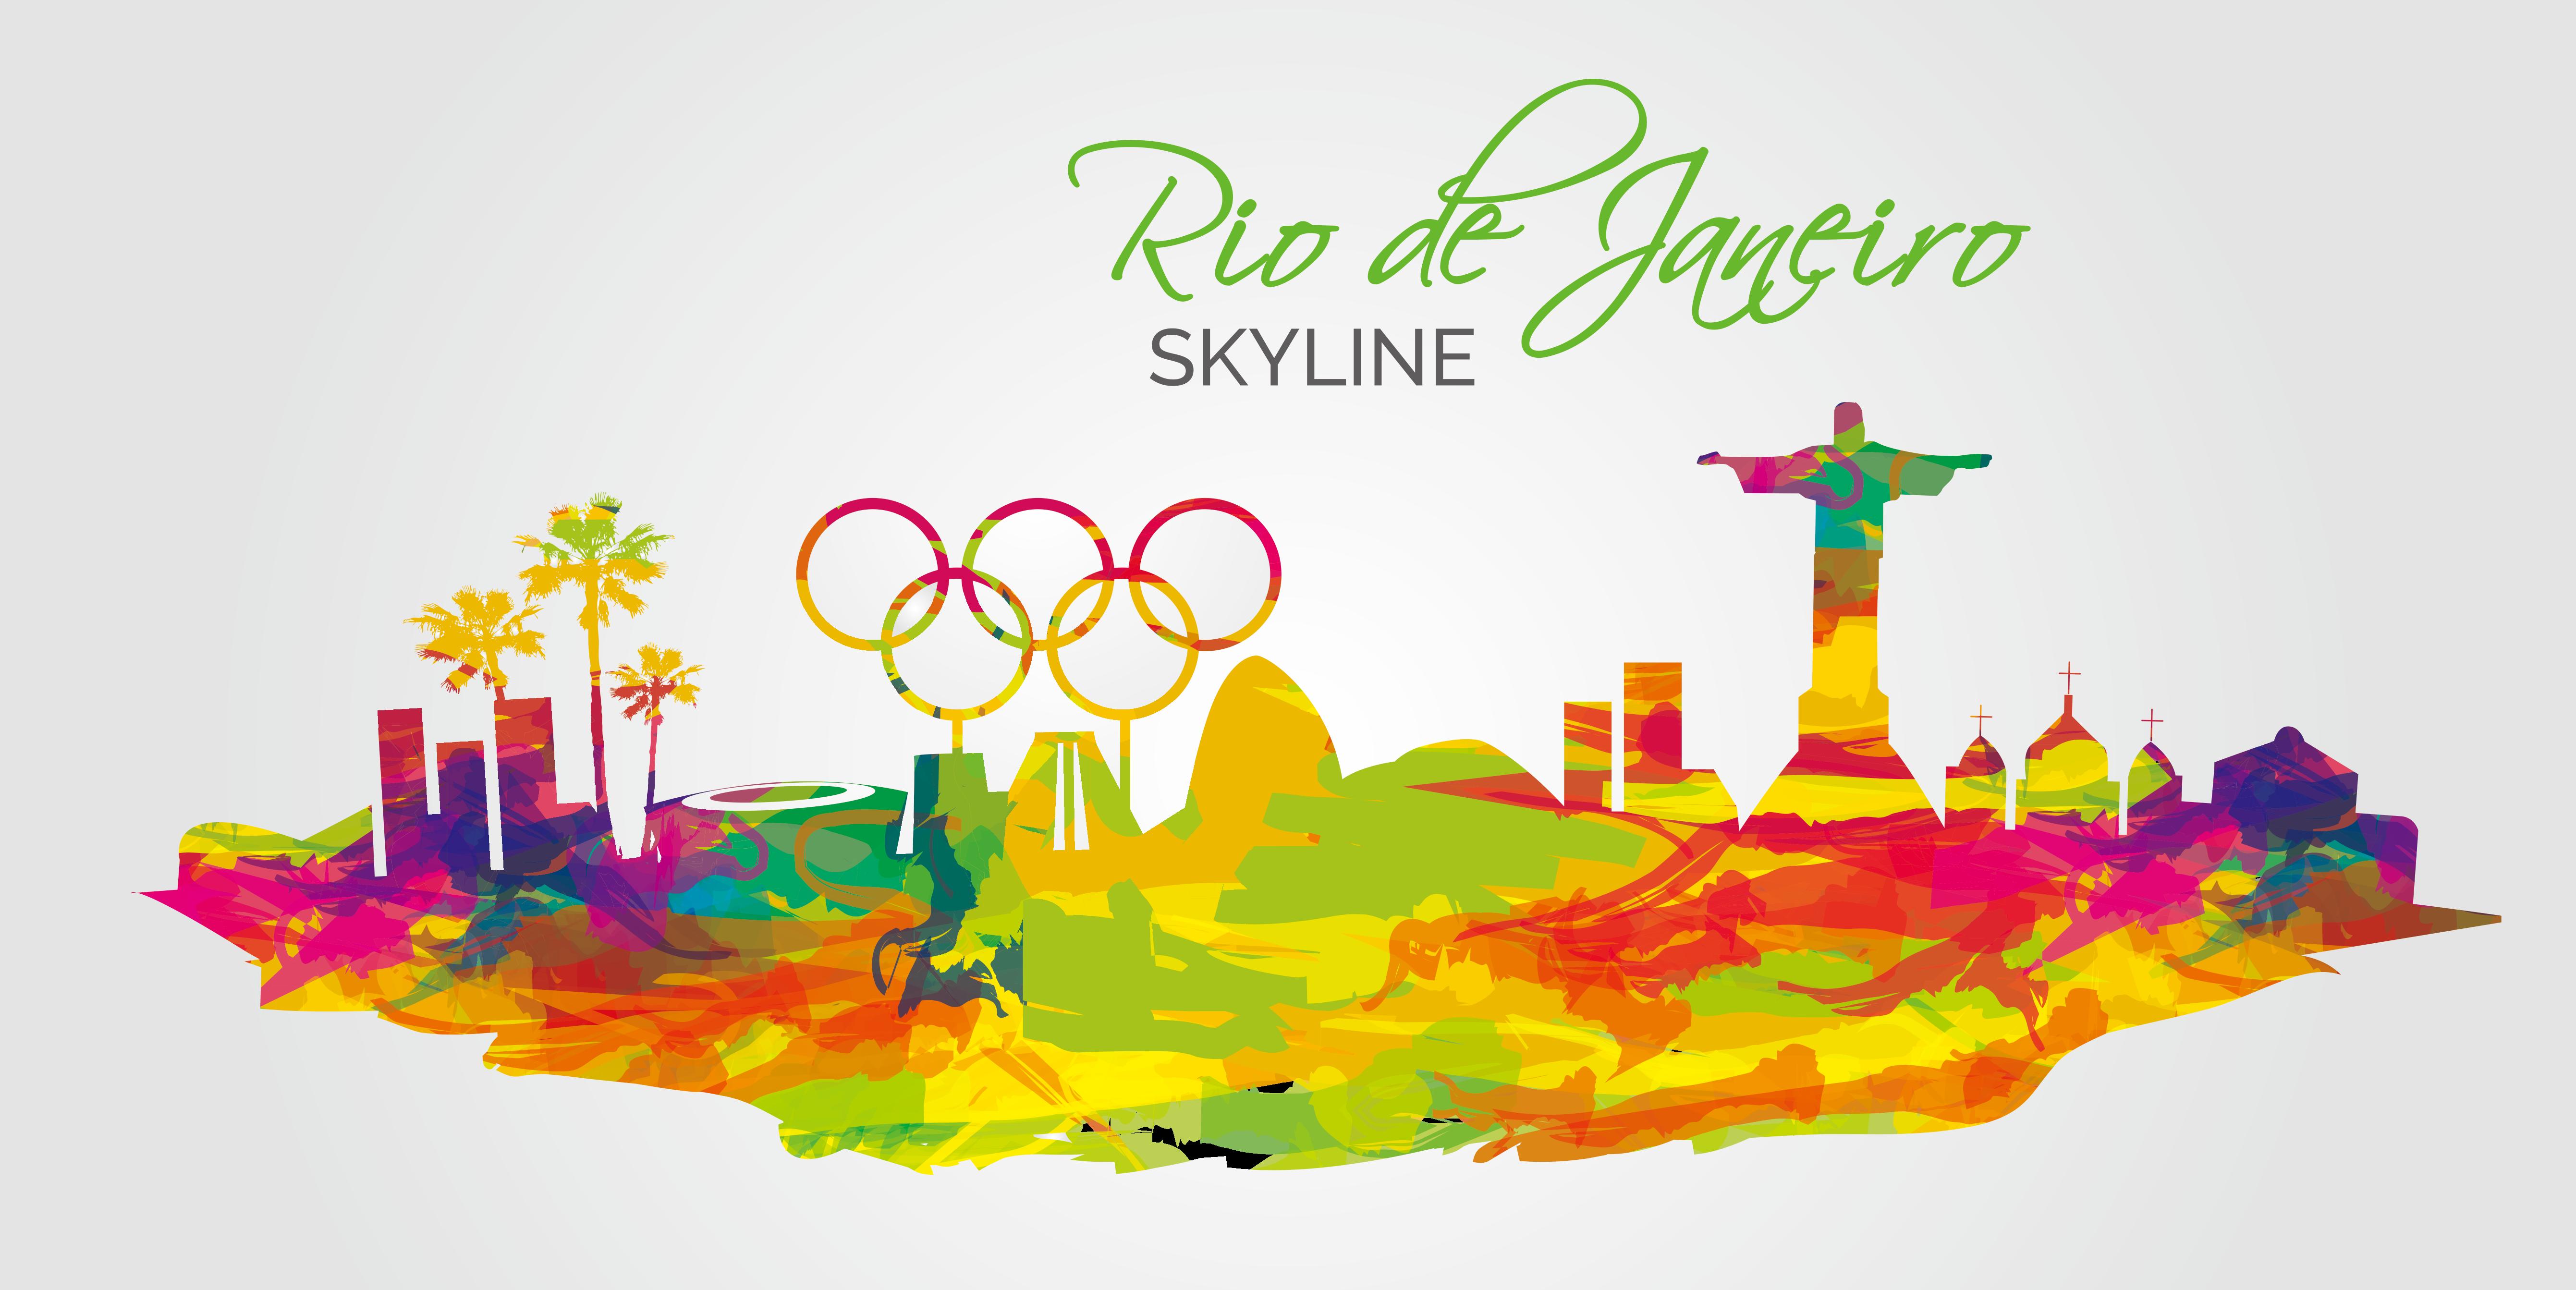 Olympics clipart medal ceremony, Olympics medal ceremony ...